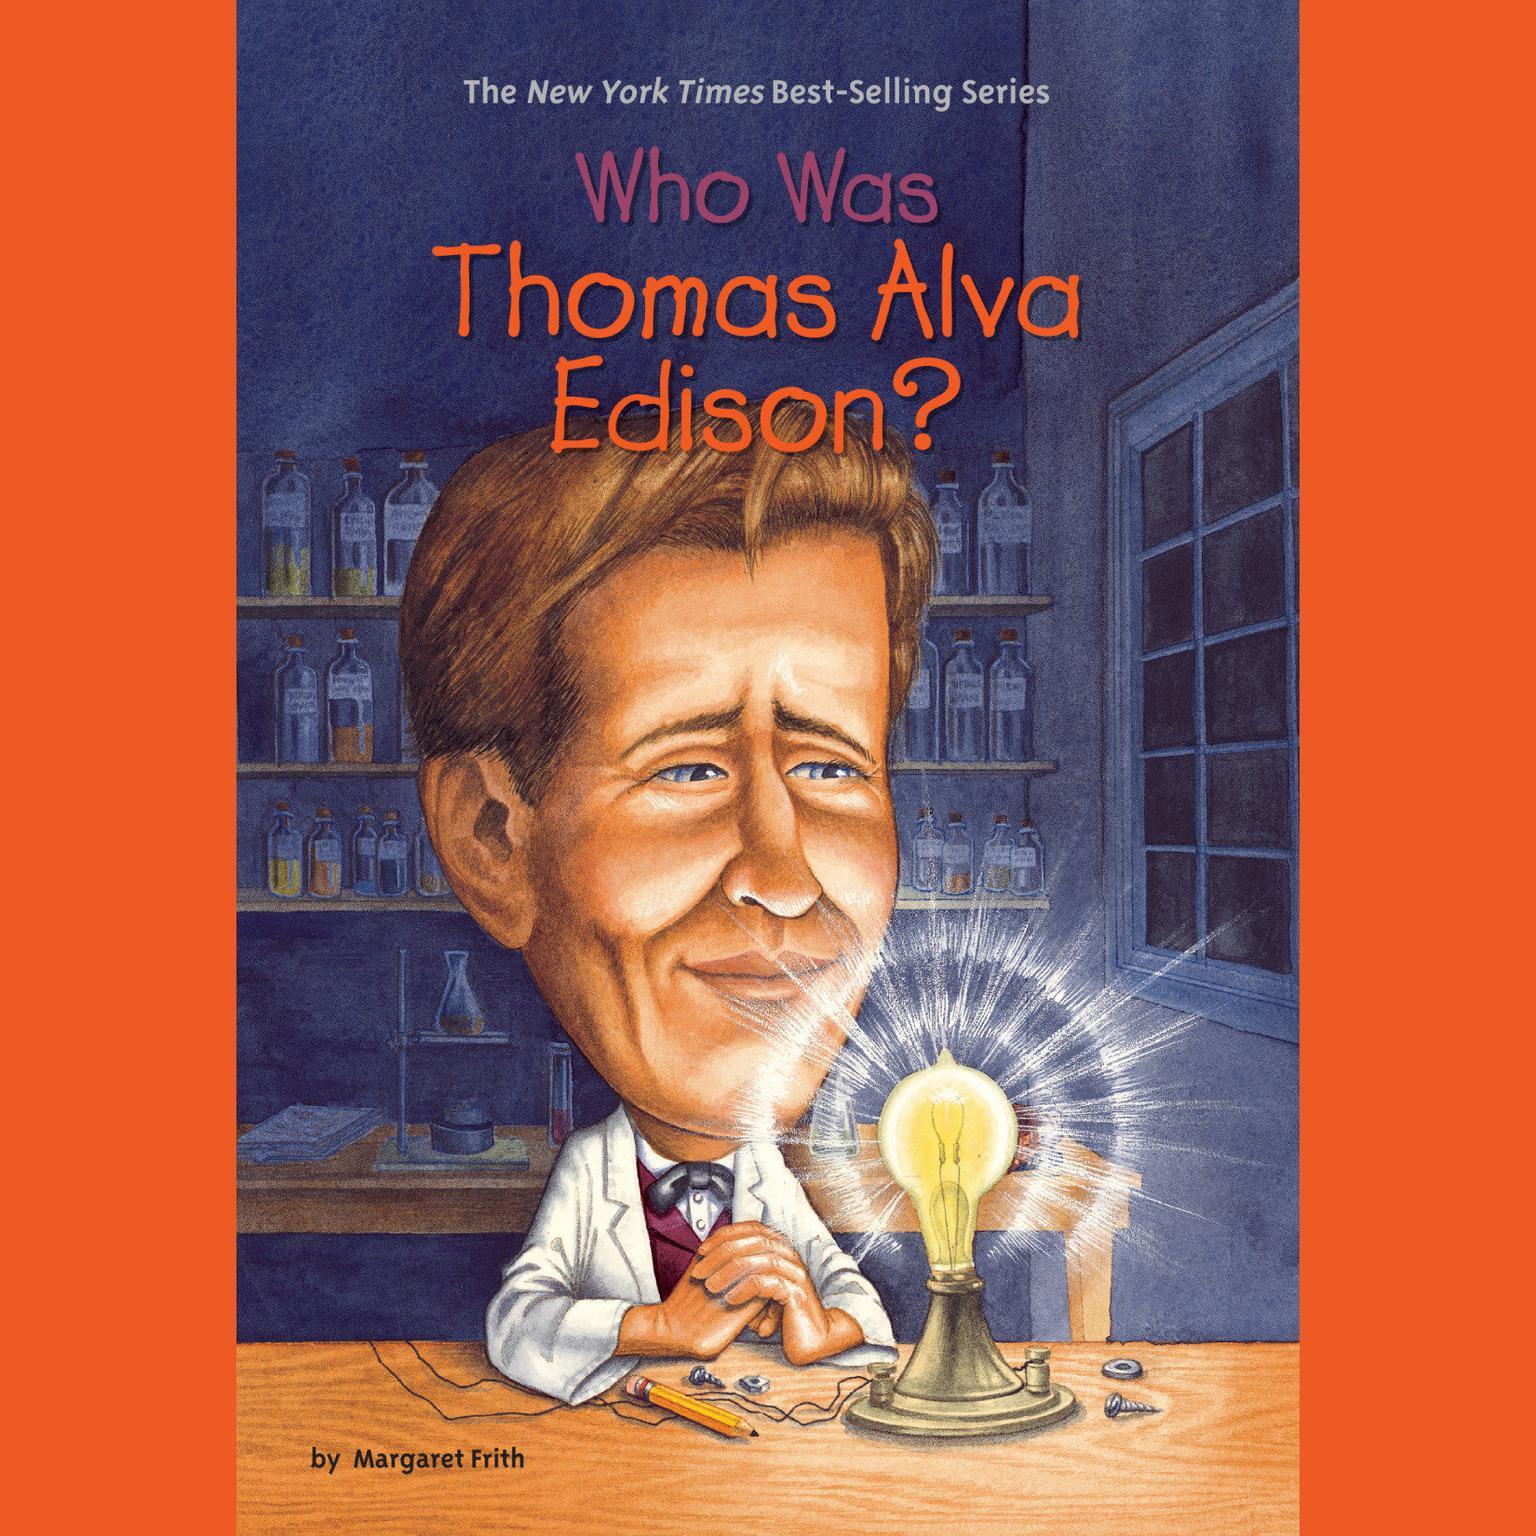 Who Was Thomas Alva Edison Audiobook